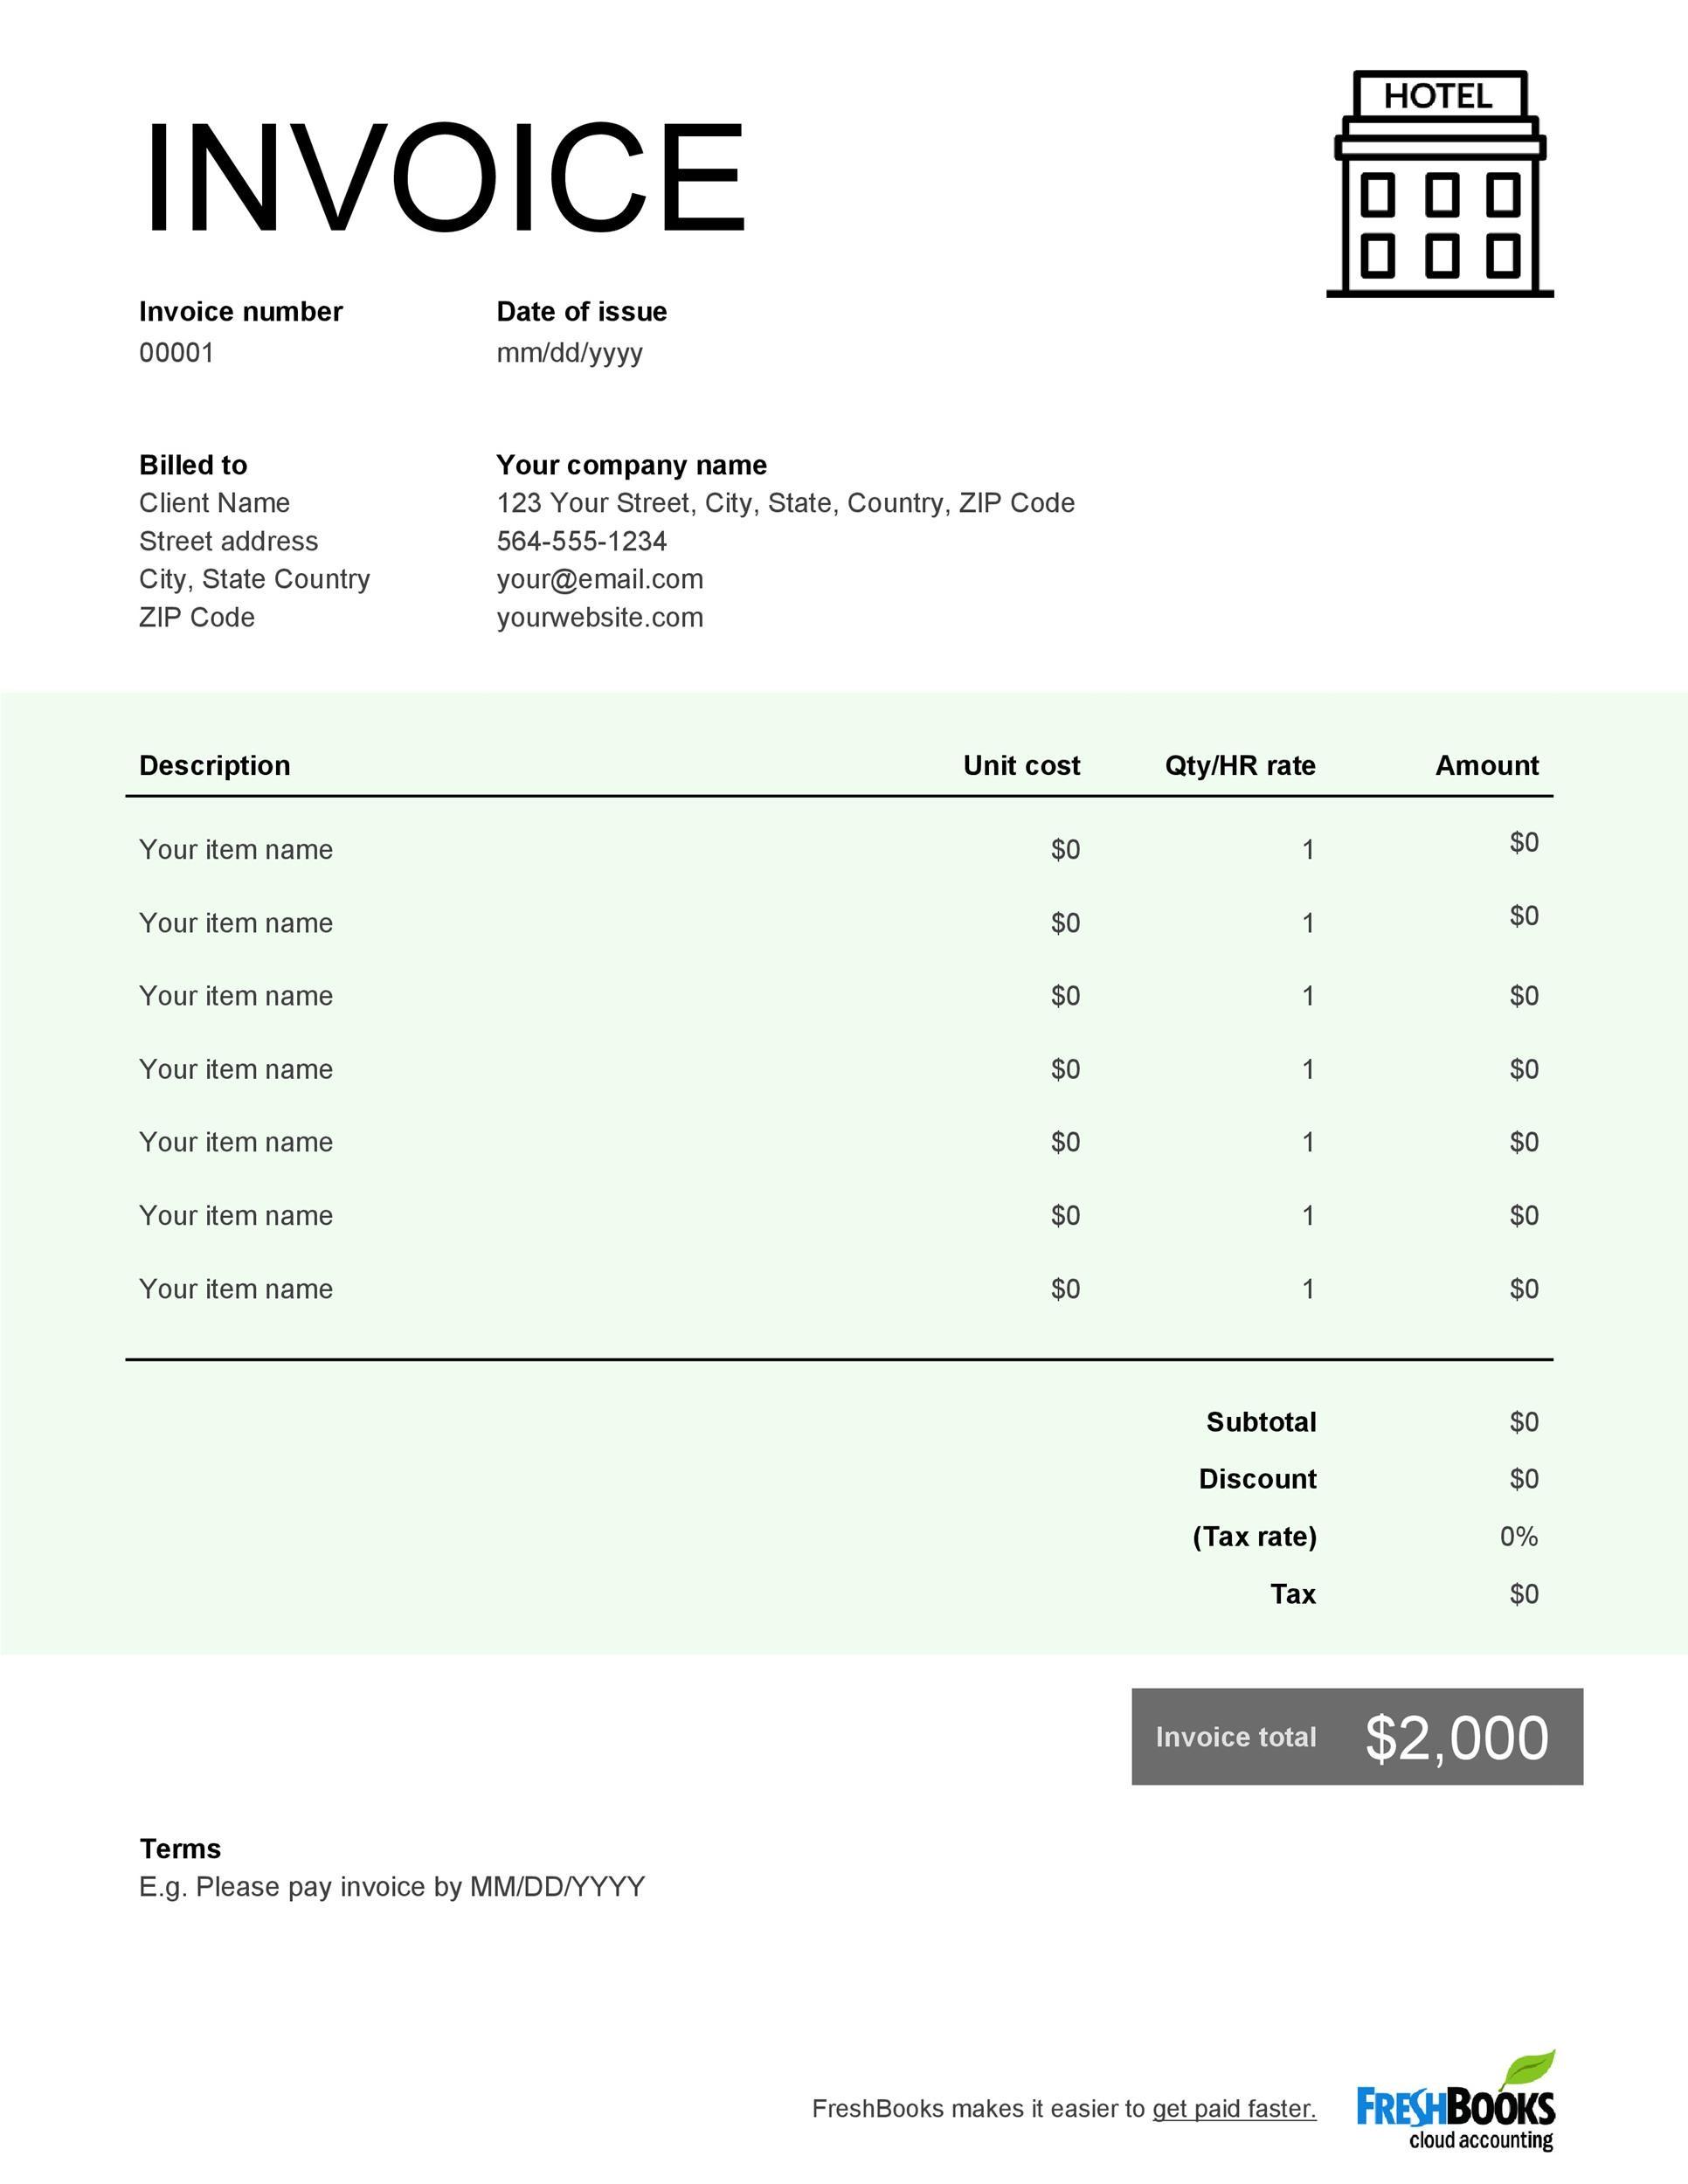 Free hotel receipt 28